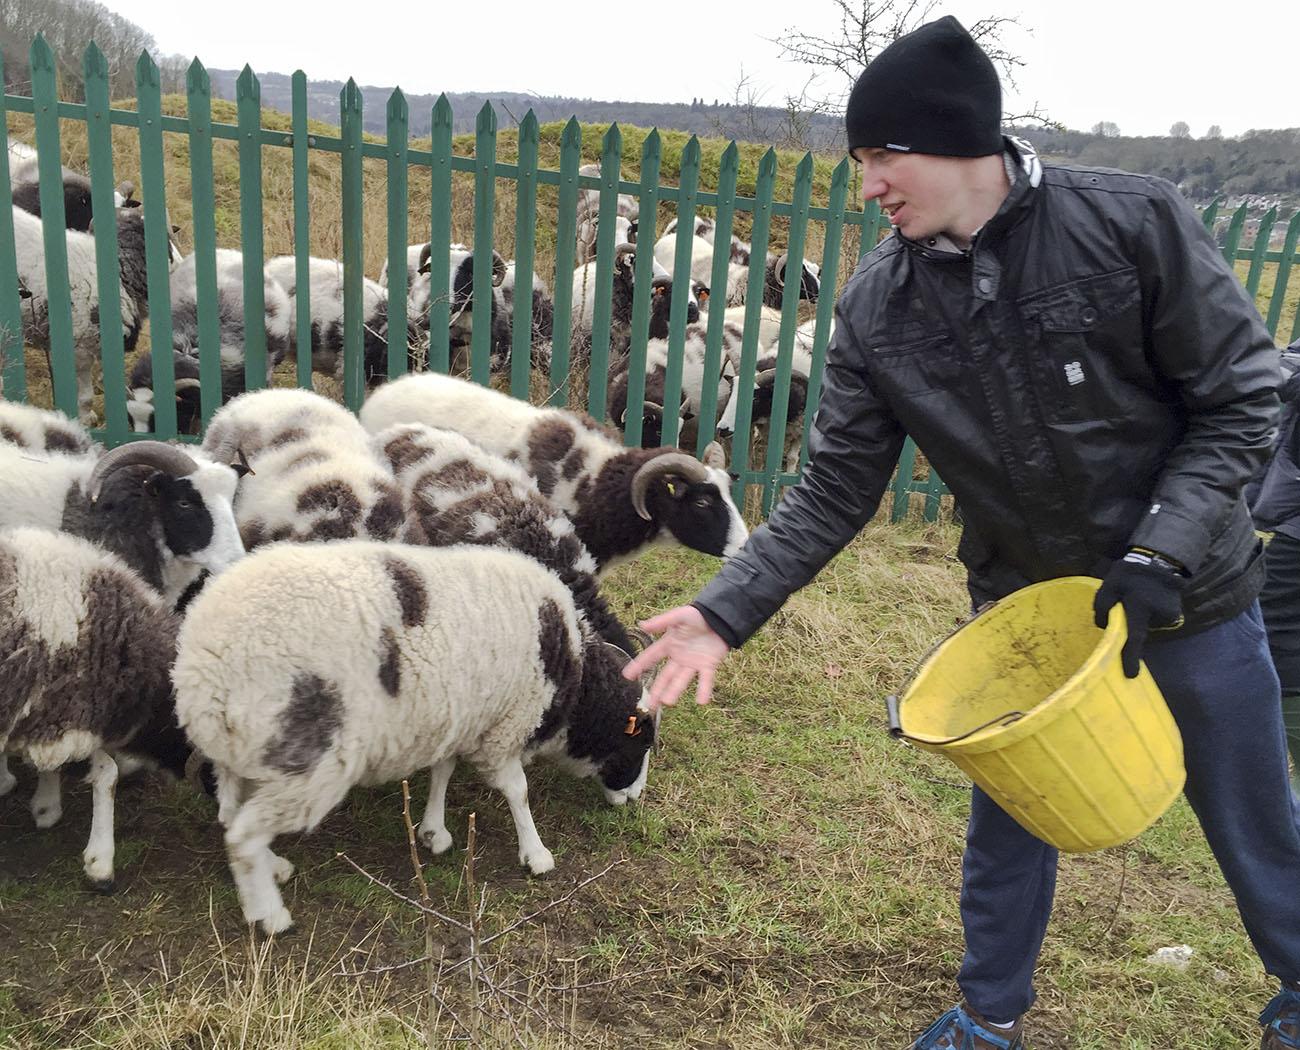 A walker feeding sheep in Riddlesdown quarry.  26 December 2014.